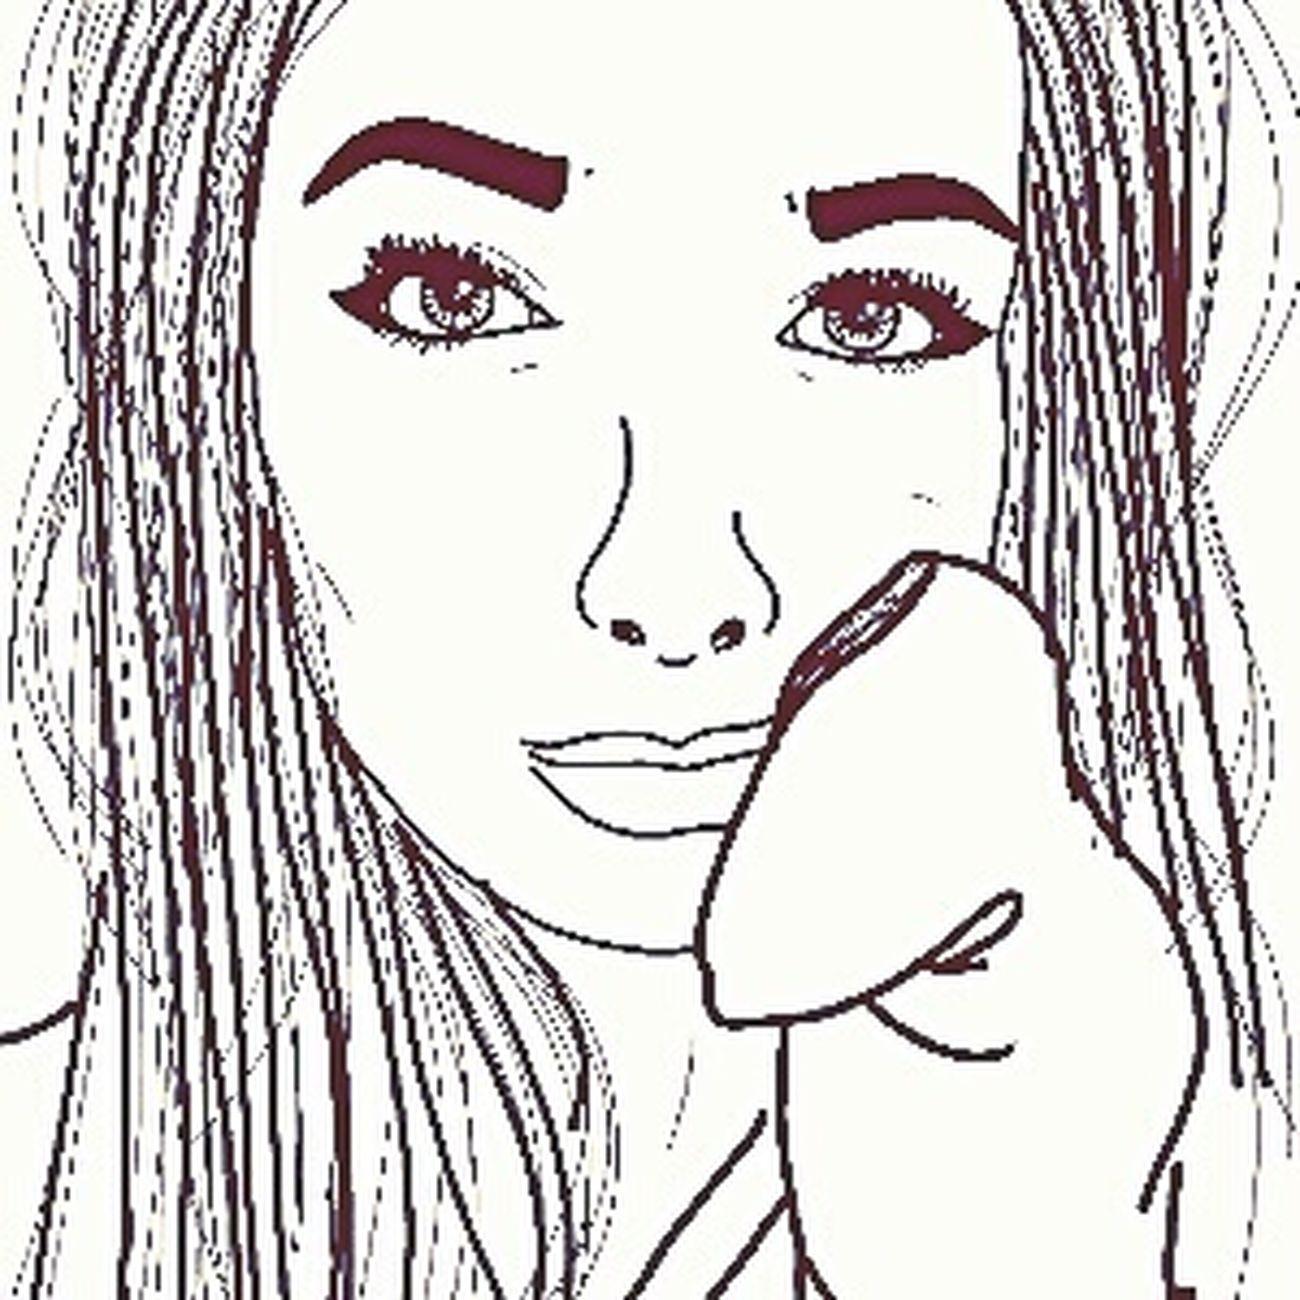 Tumblr Style Cartoon Draw Art People Tumblroutline Longhair Girl Selfıe